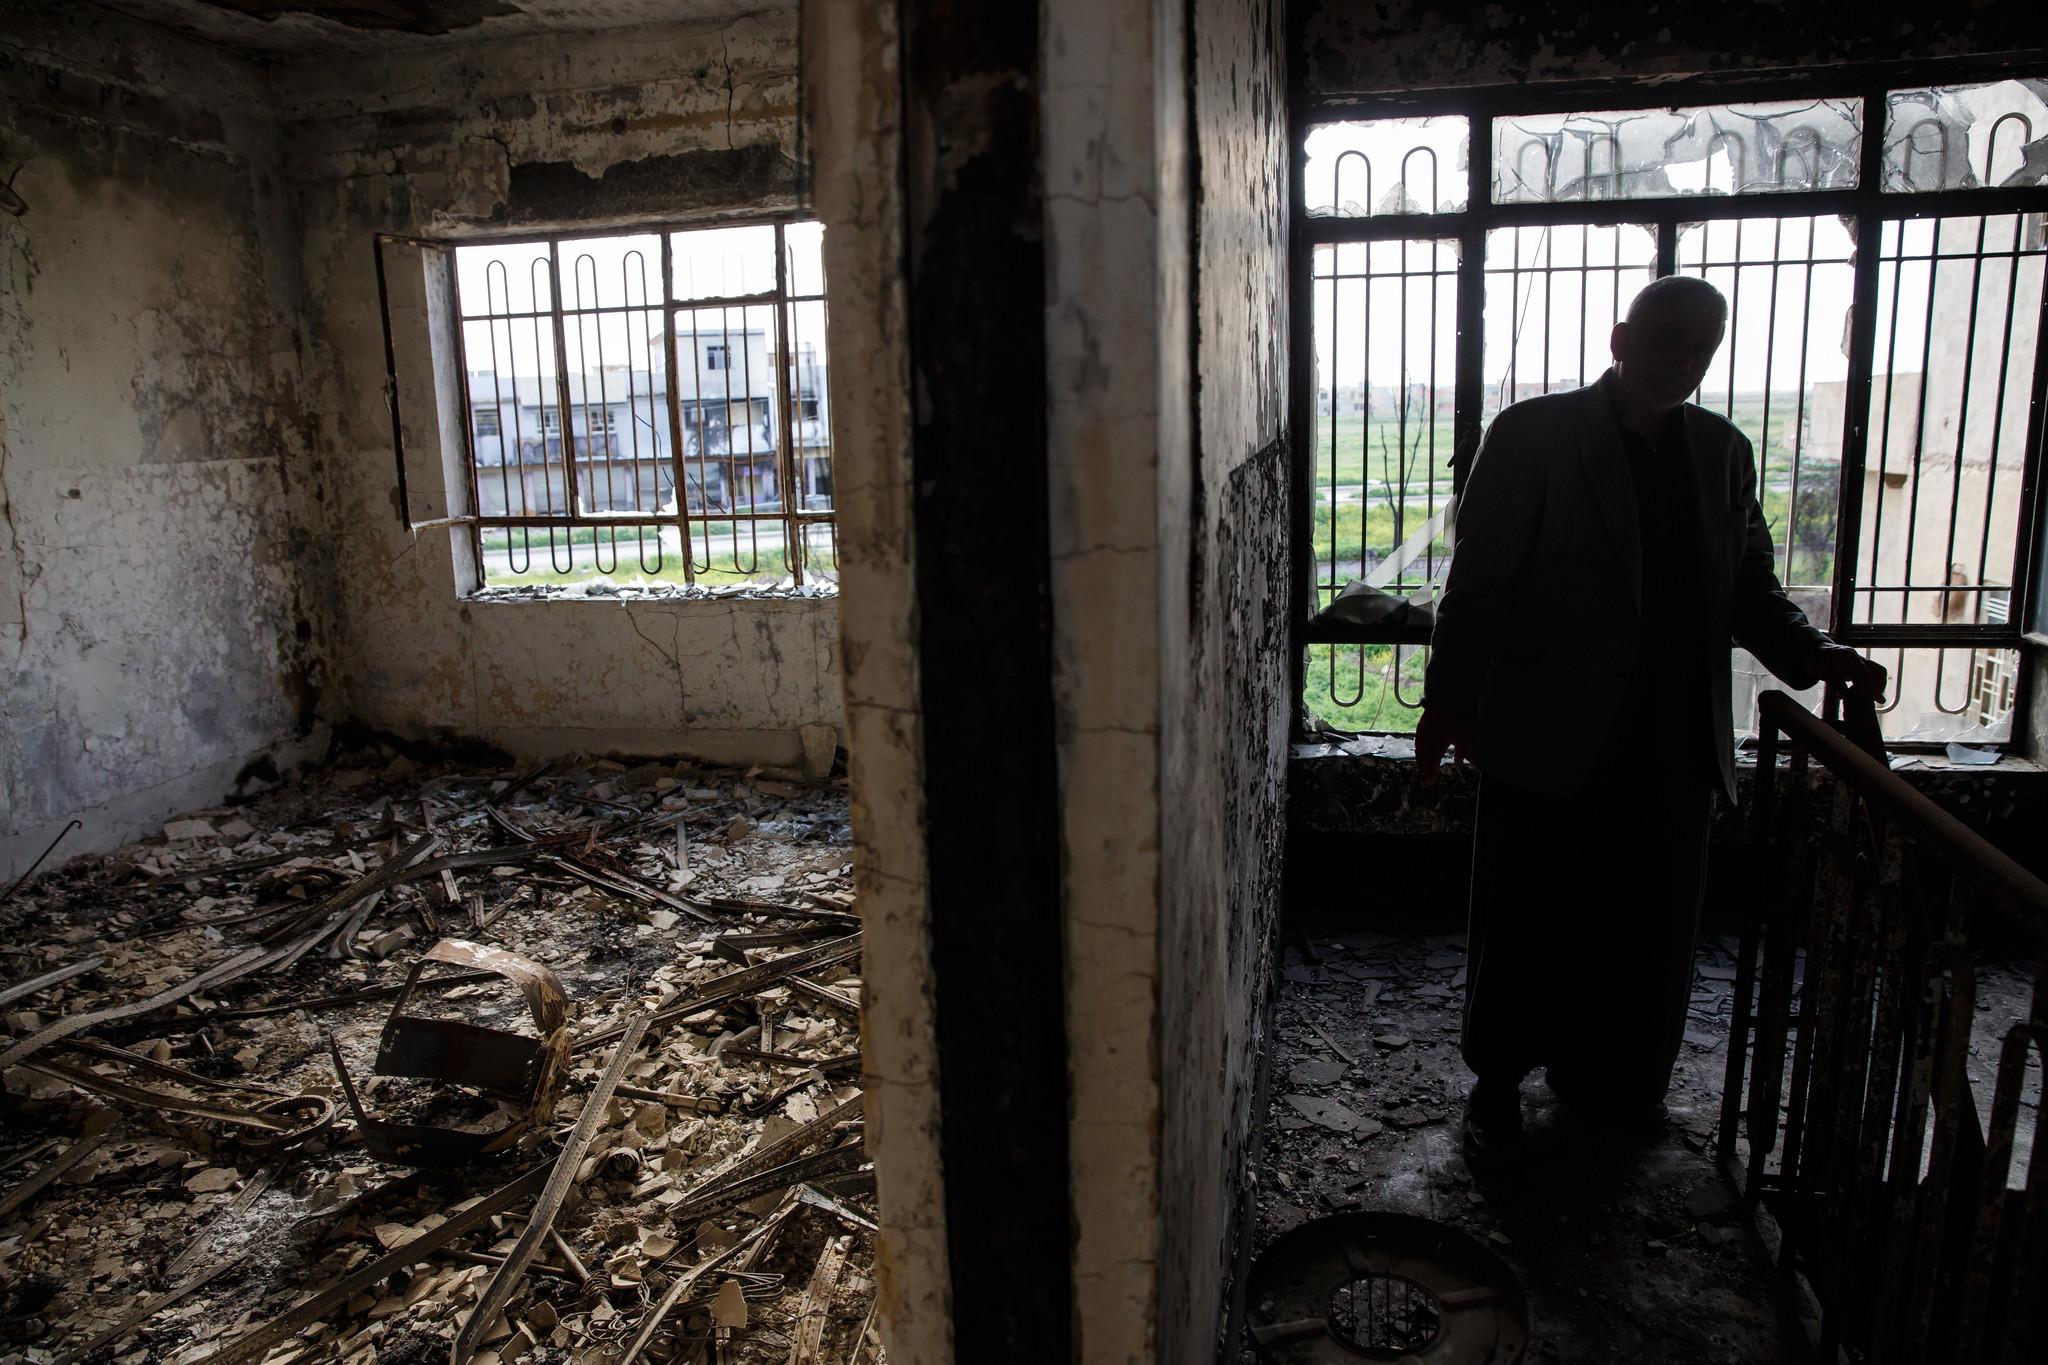 Tawfiq Abosh Jabu Sakar wanders through his home destroyed by Islamic State in Qaraqosh, Iraq.